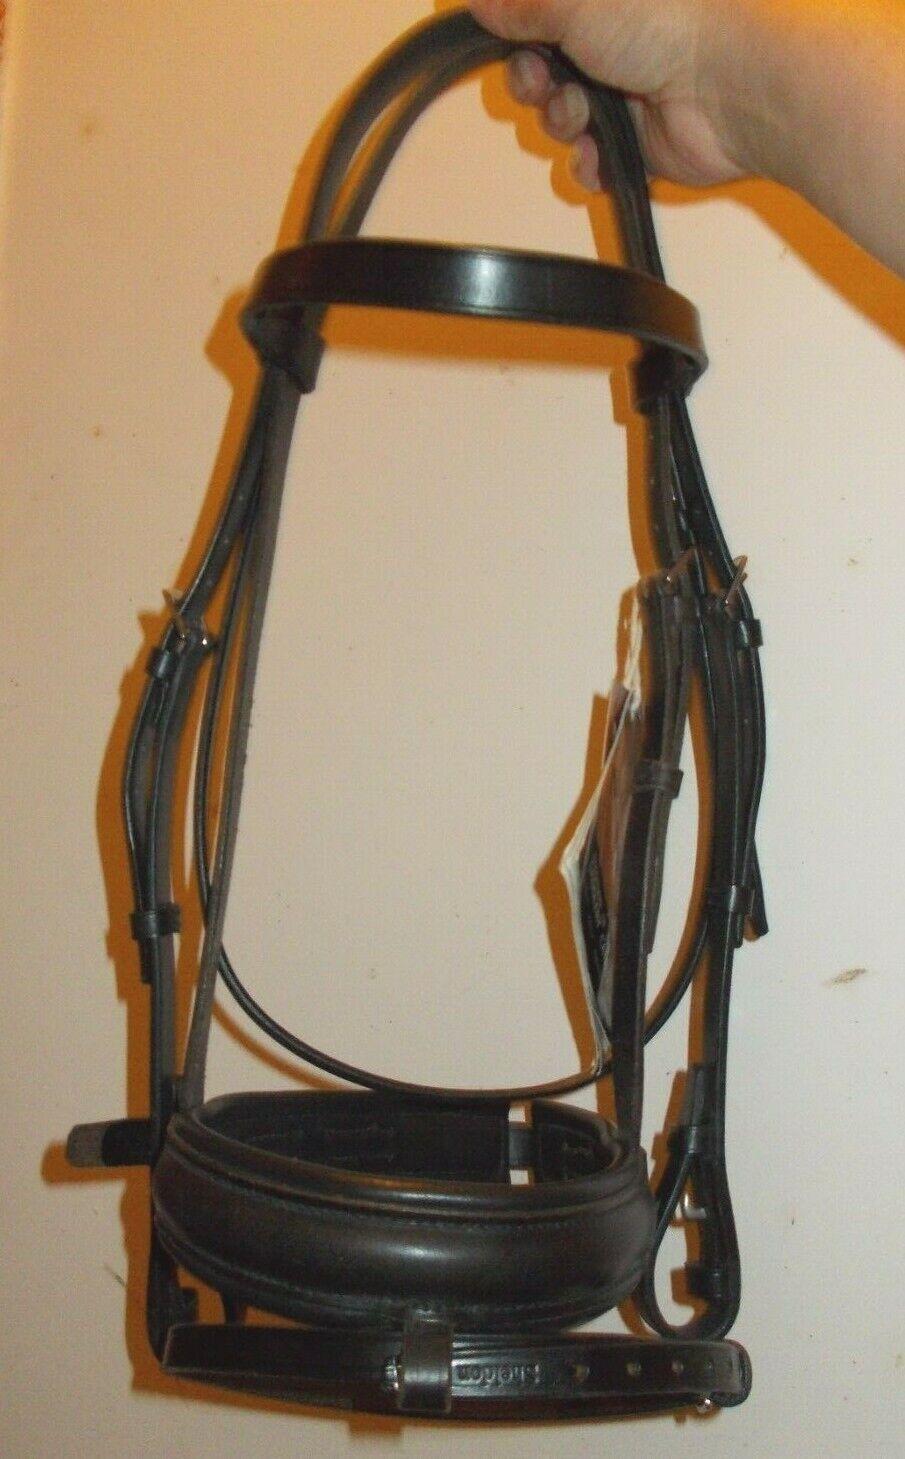 New jeffries crank flash bridle